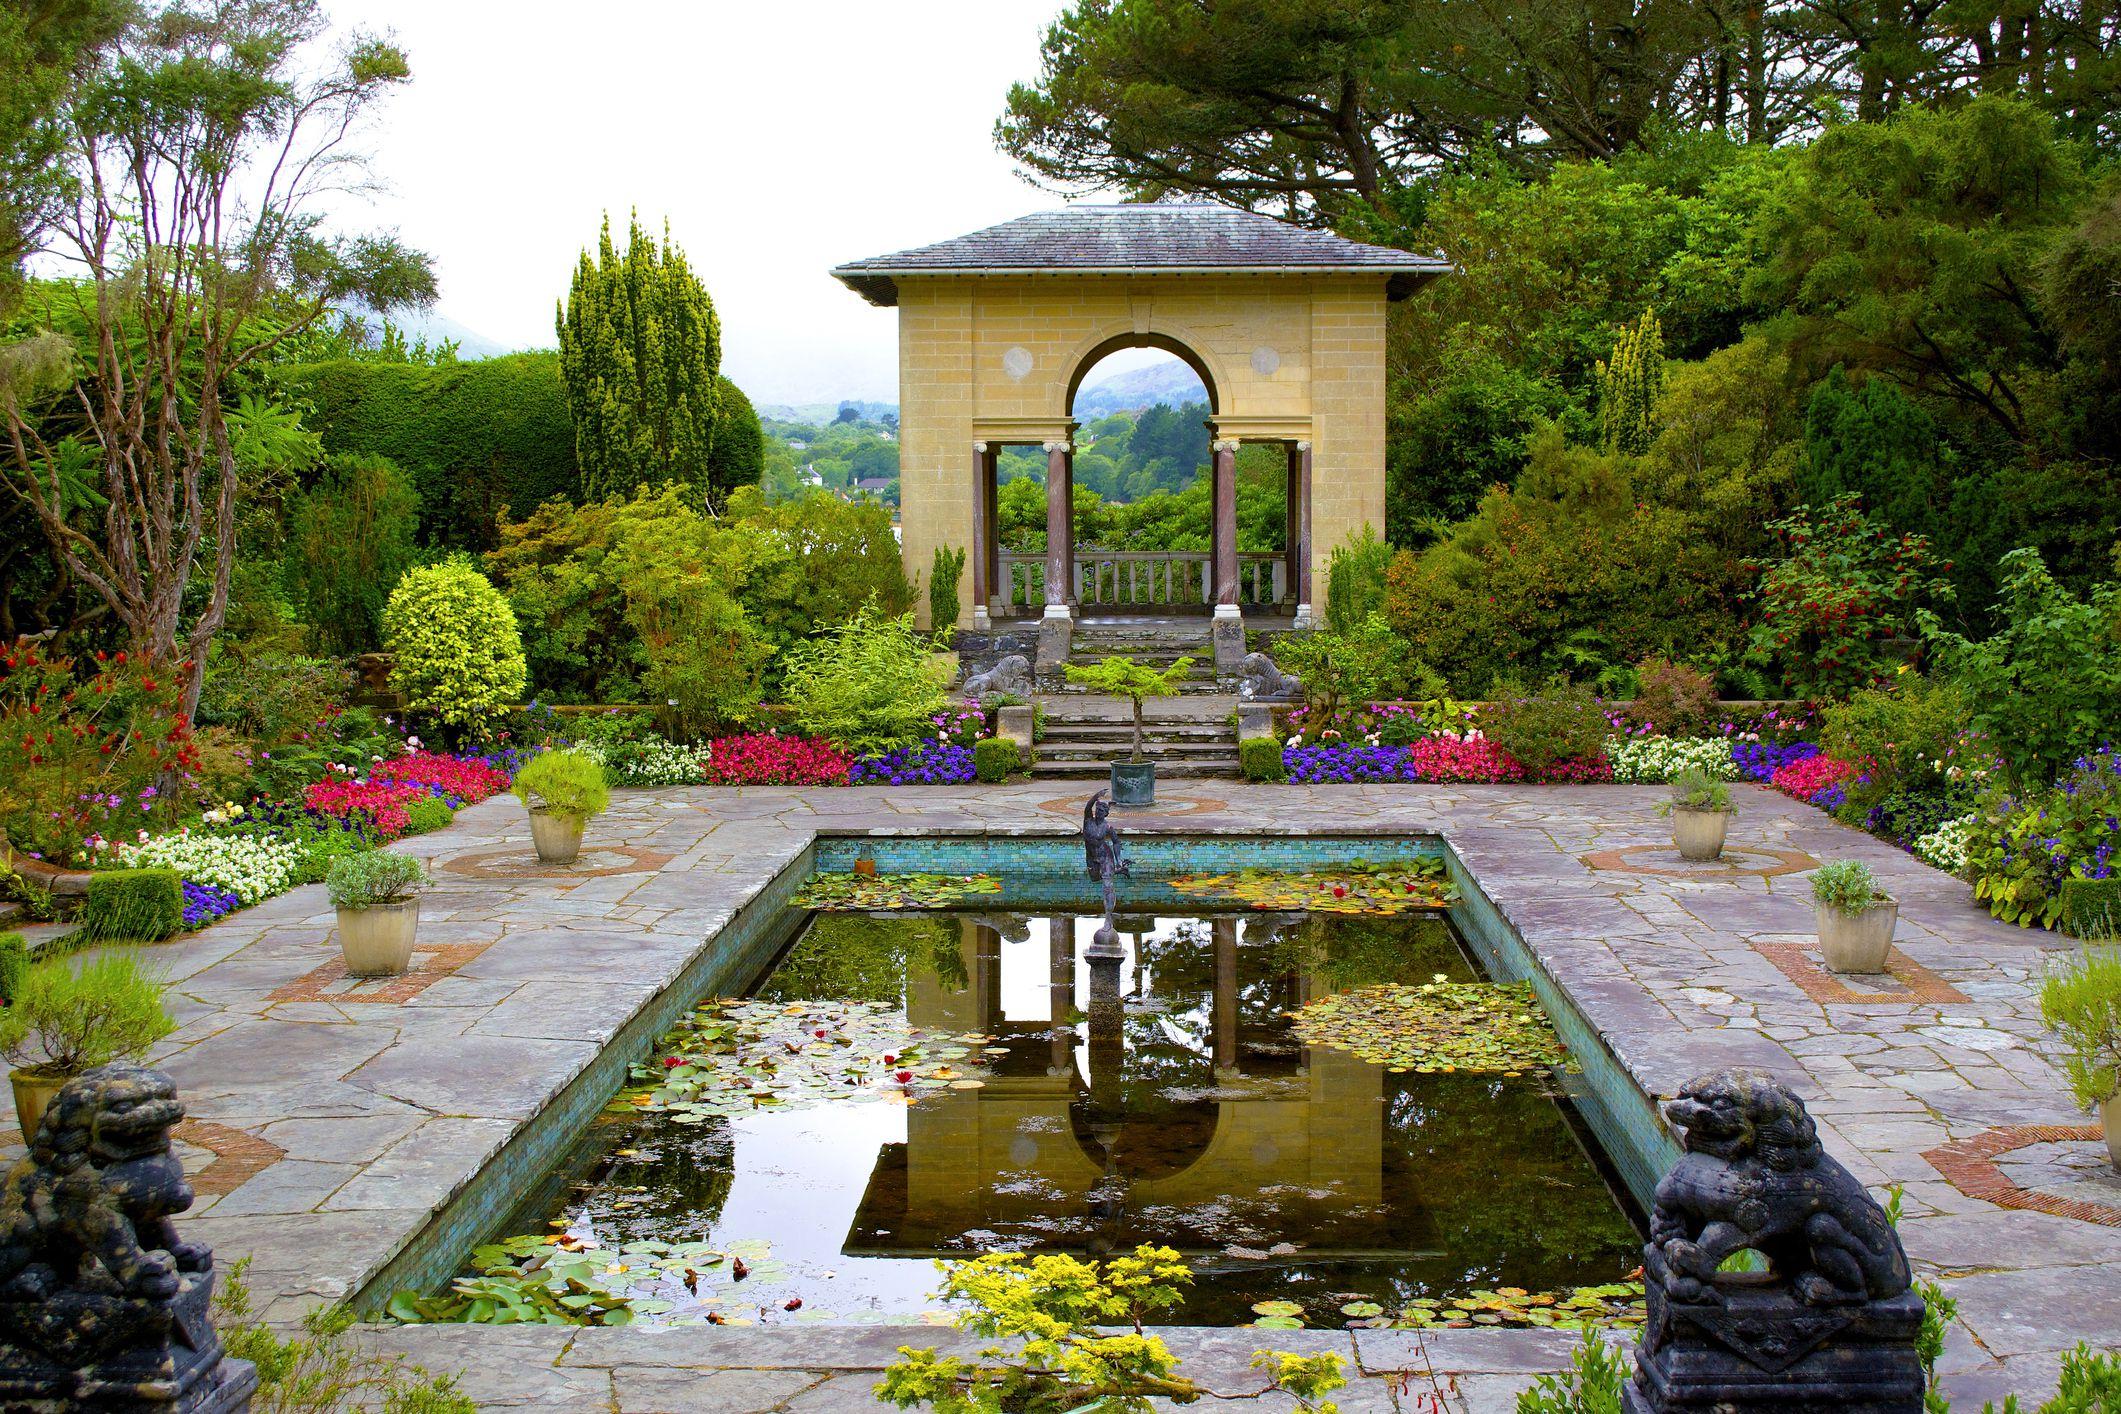 Pond and gardens on Irish island